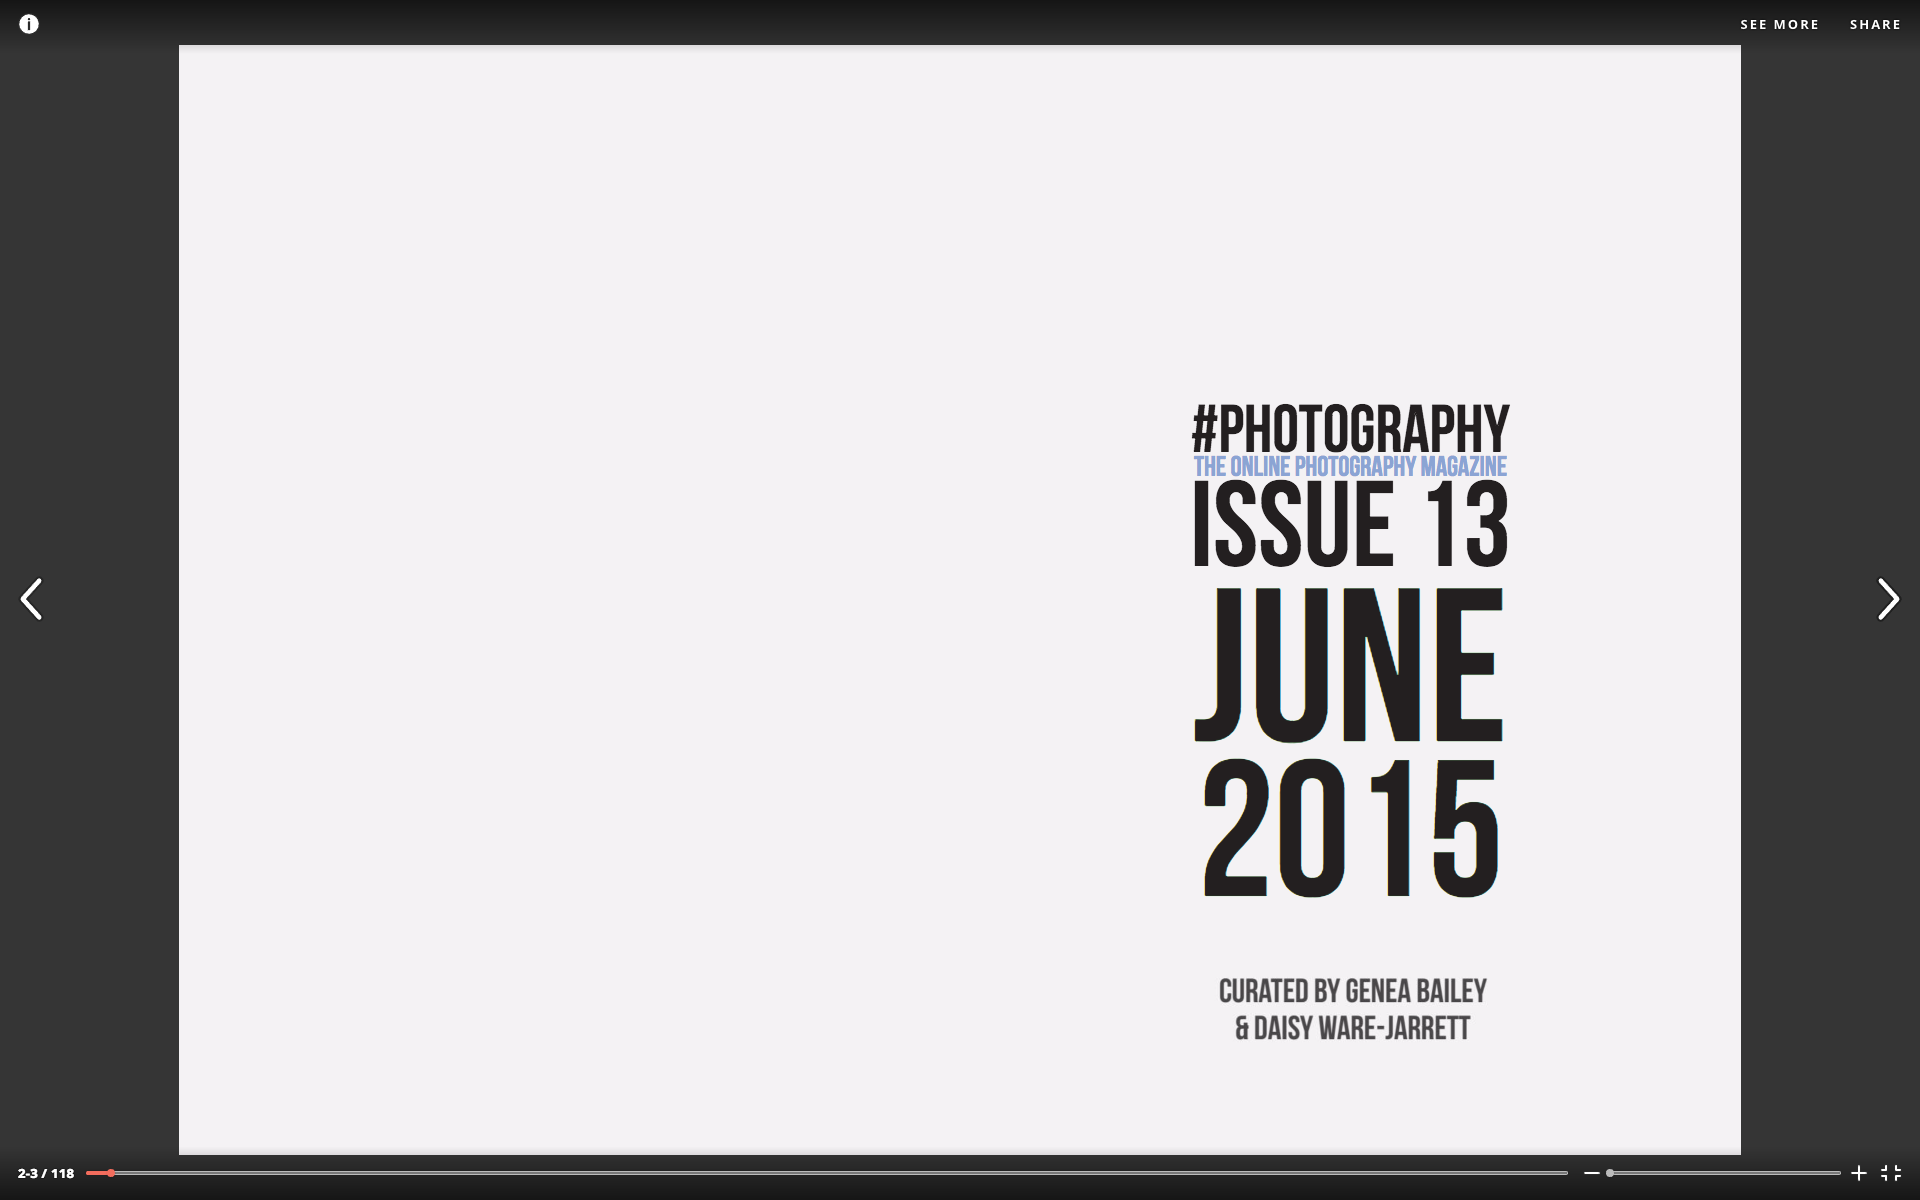 2015 06 27 Photography  Screen Shot 2017-03-26 at 11.17.12 PM.png